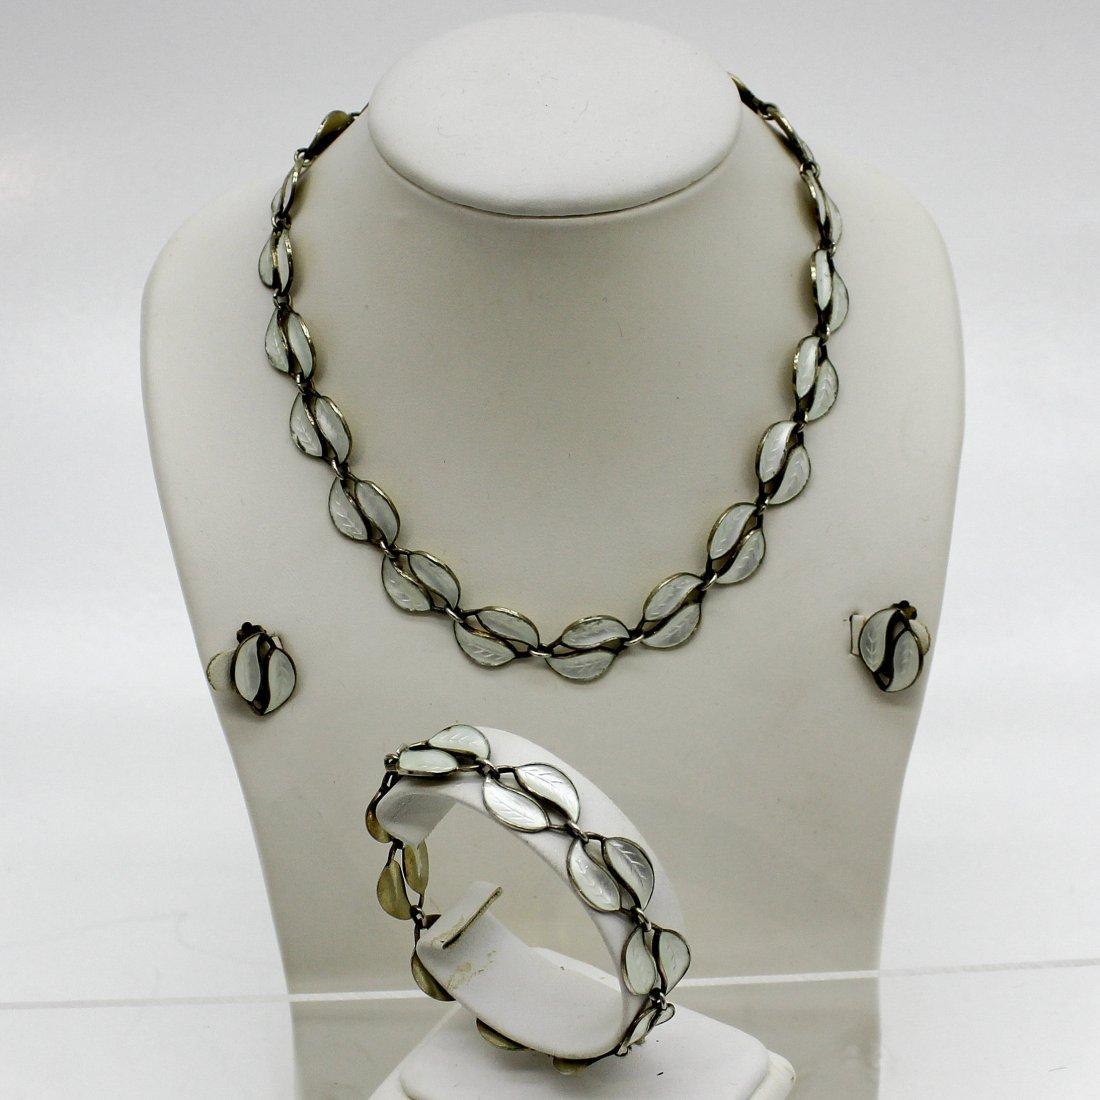 David Andersen Silver and Enamel Jewelry